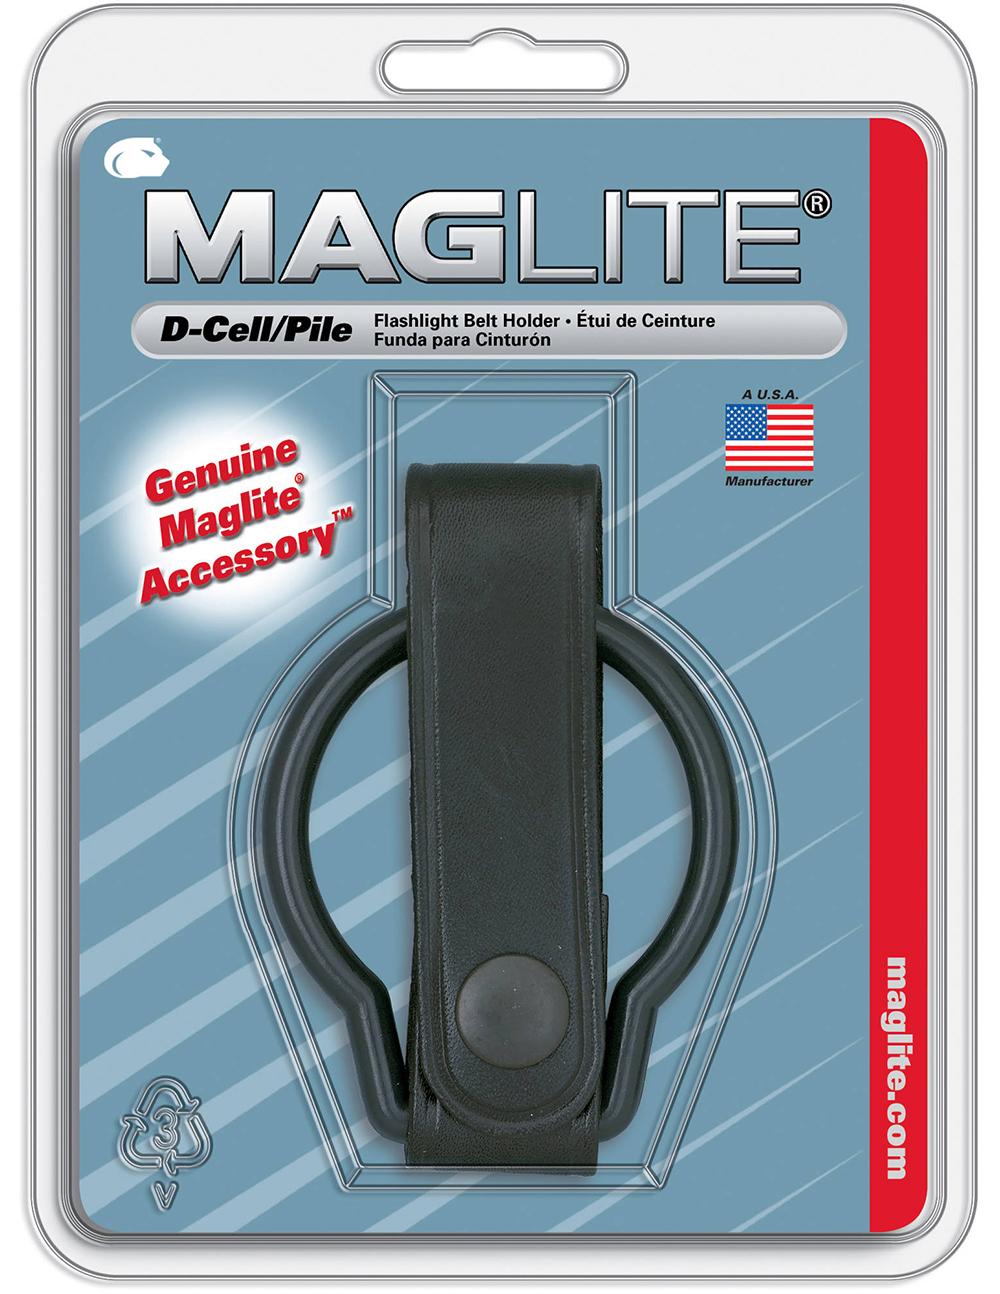 ASXD036 Держатель на ремень Maglite Маглайт для фонарей серии D-cell, в блистере